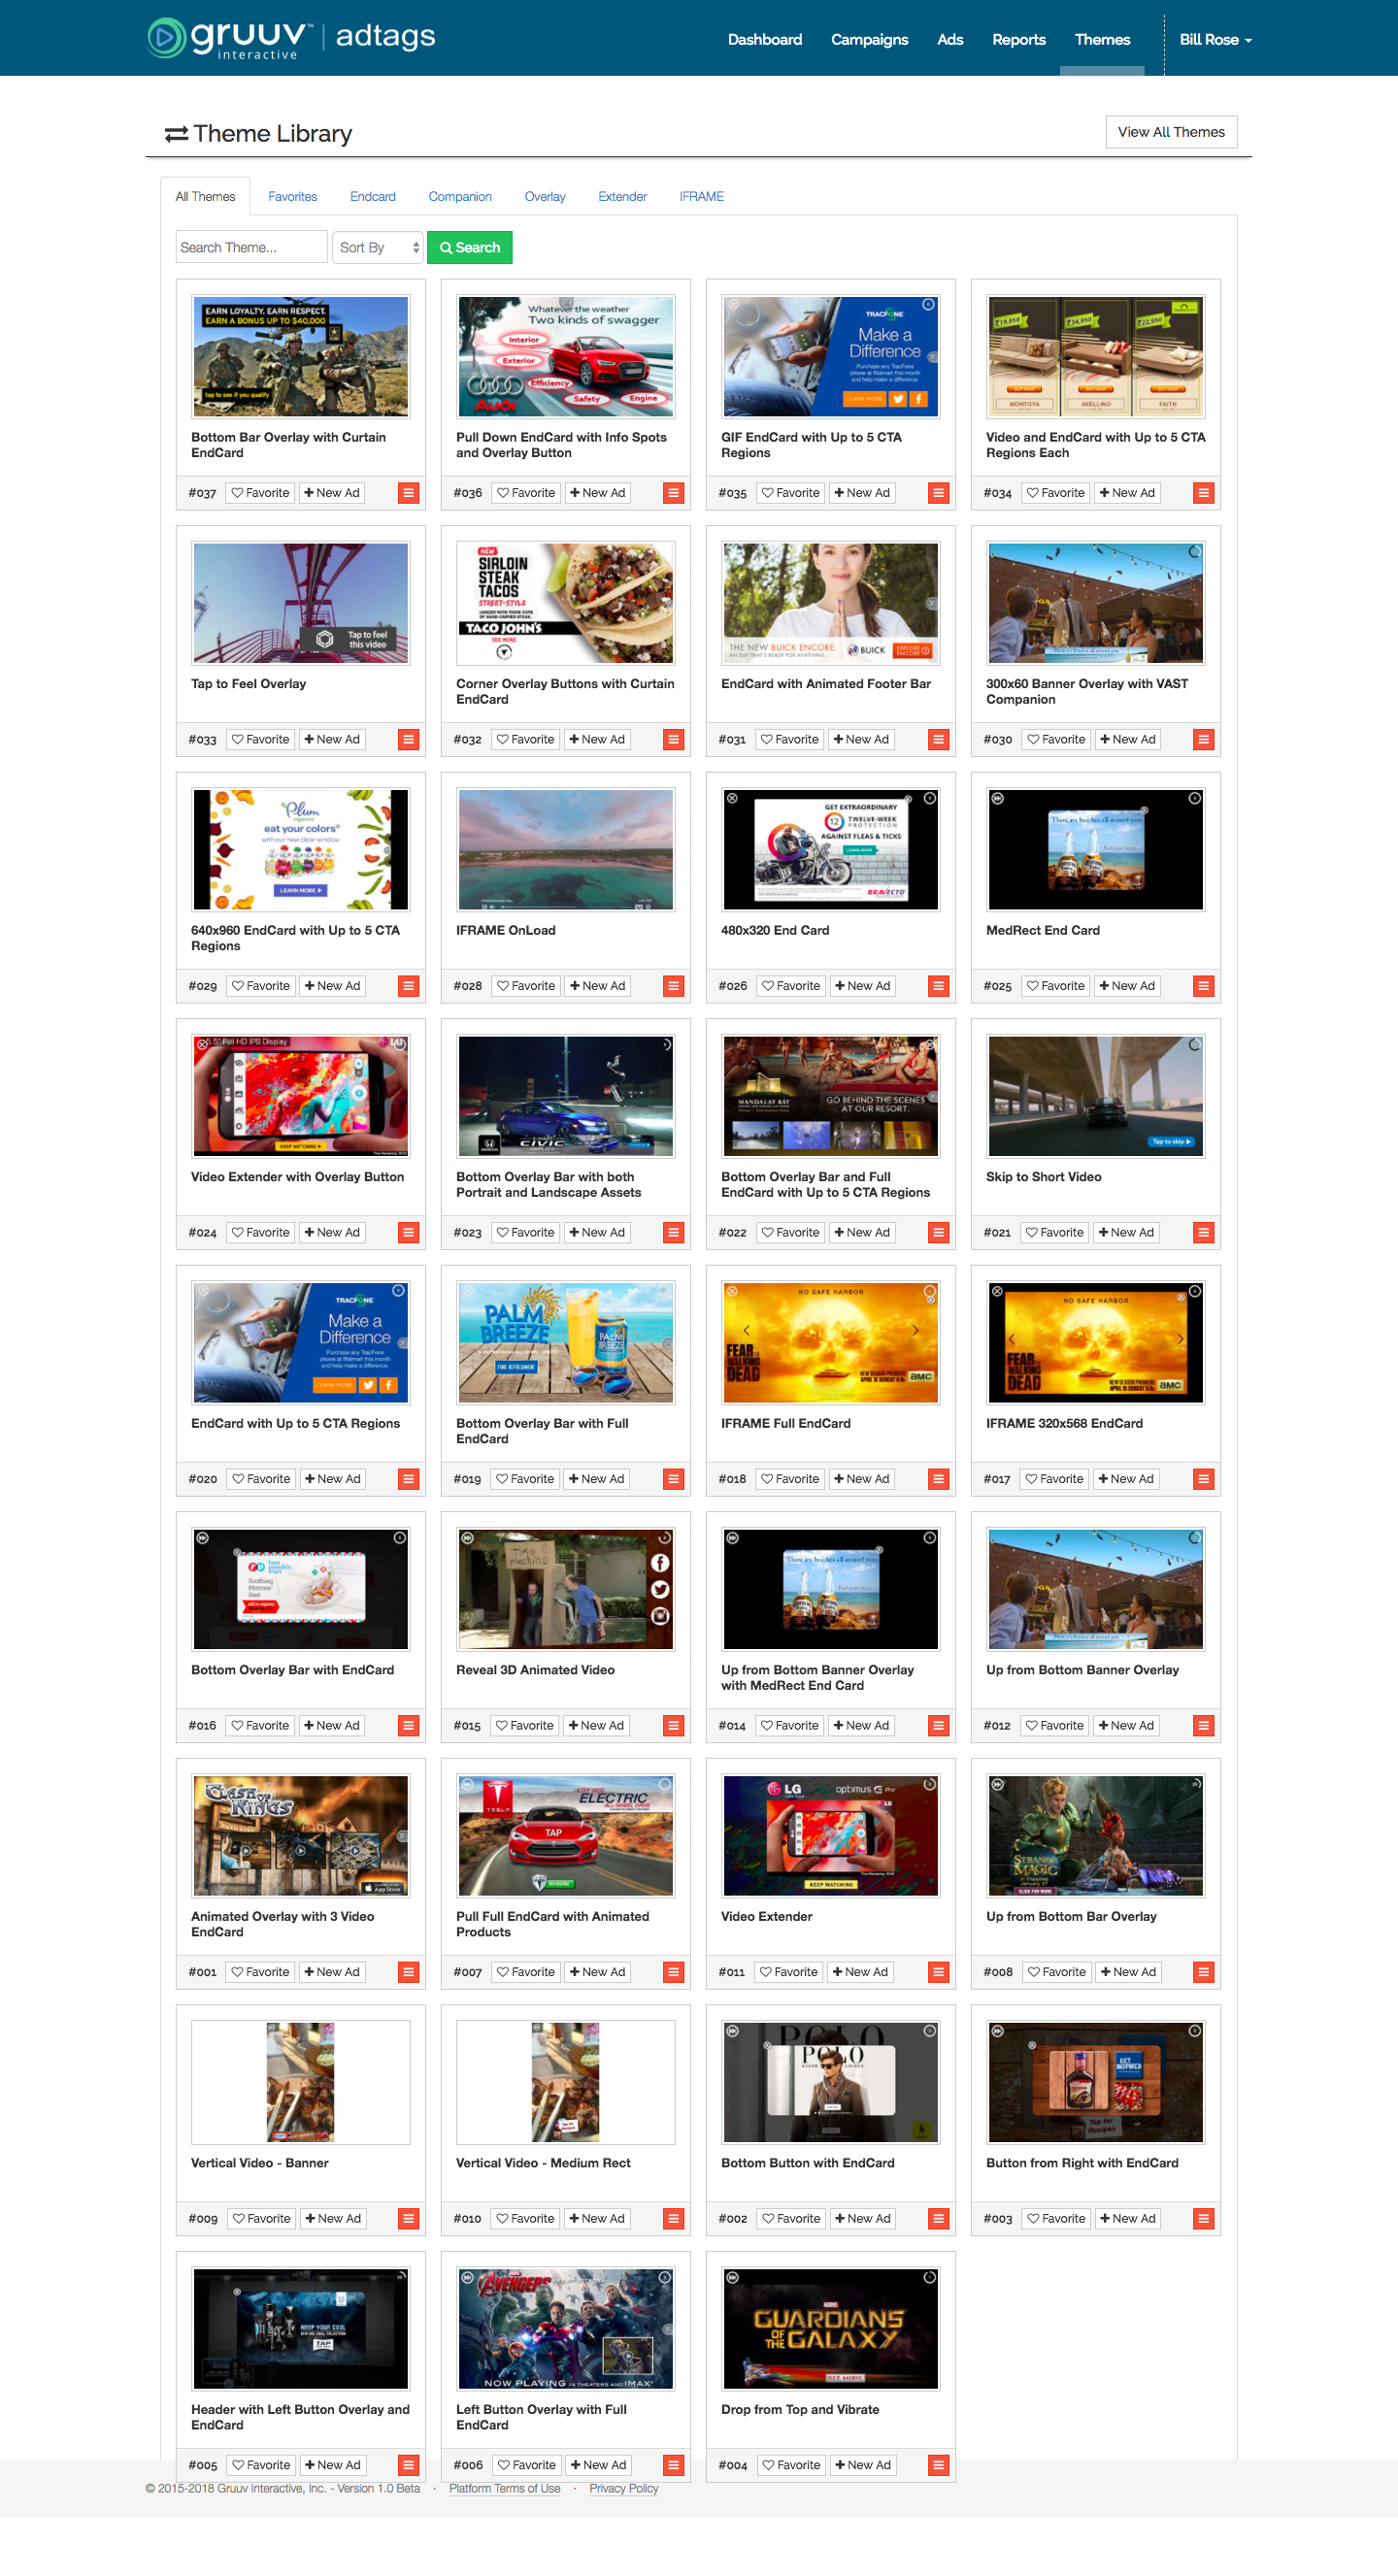 Gruuv Interactive Demo - Theme Library